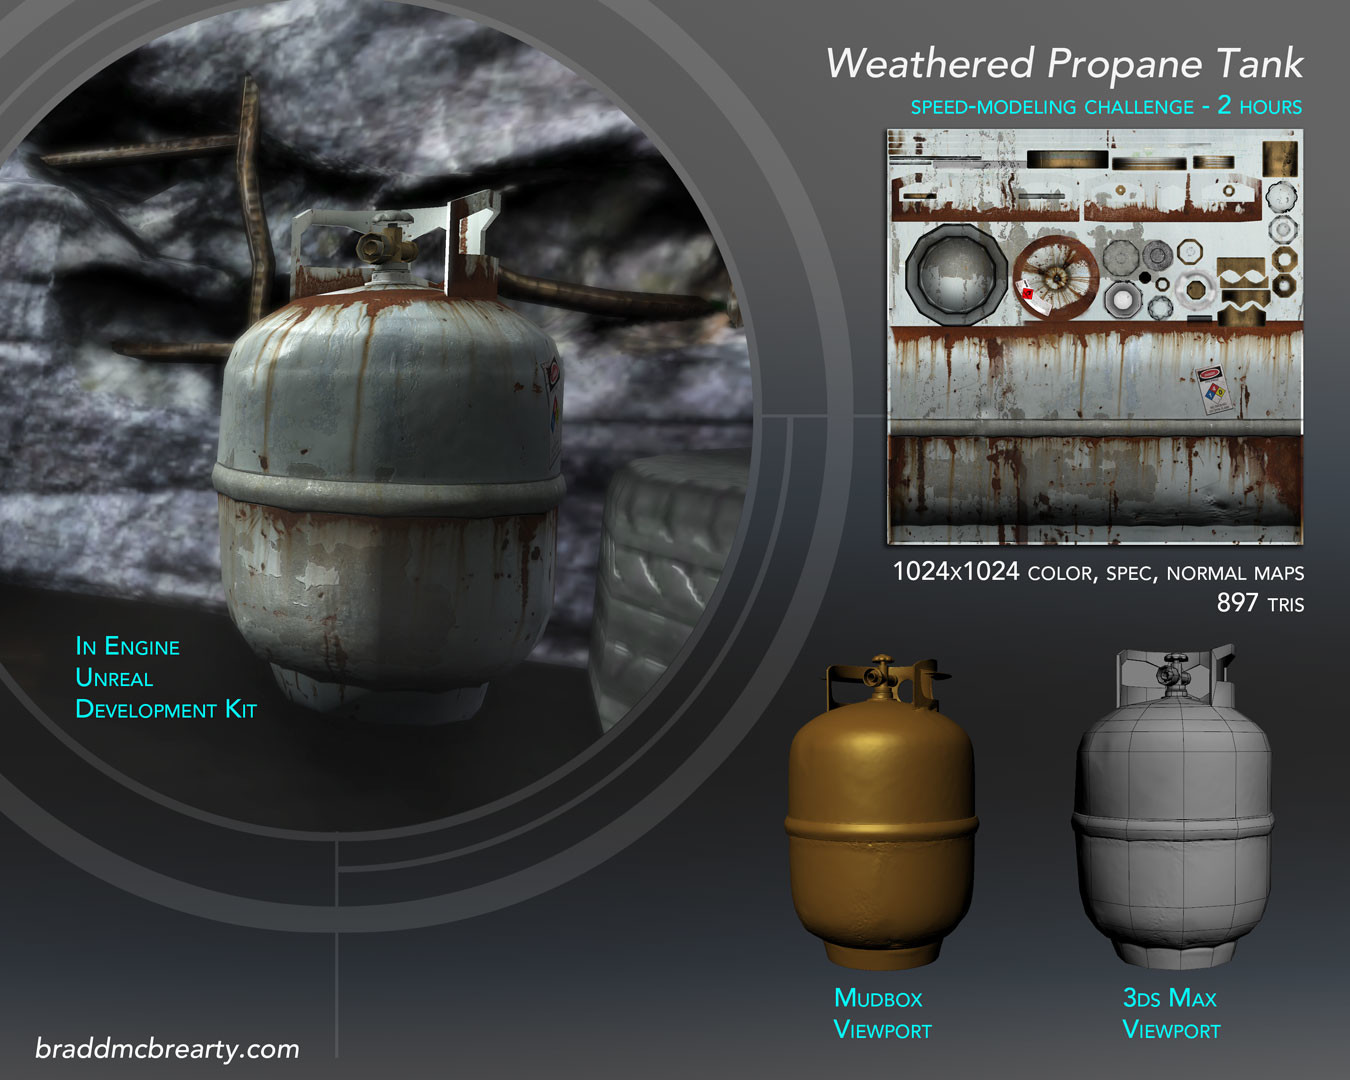 Bradd mcbrearty propane